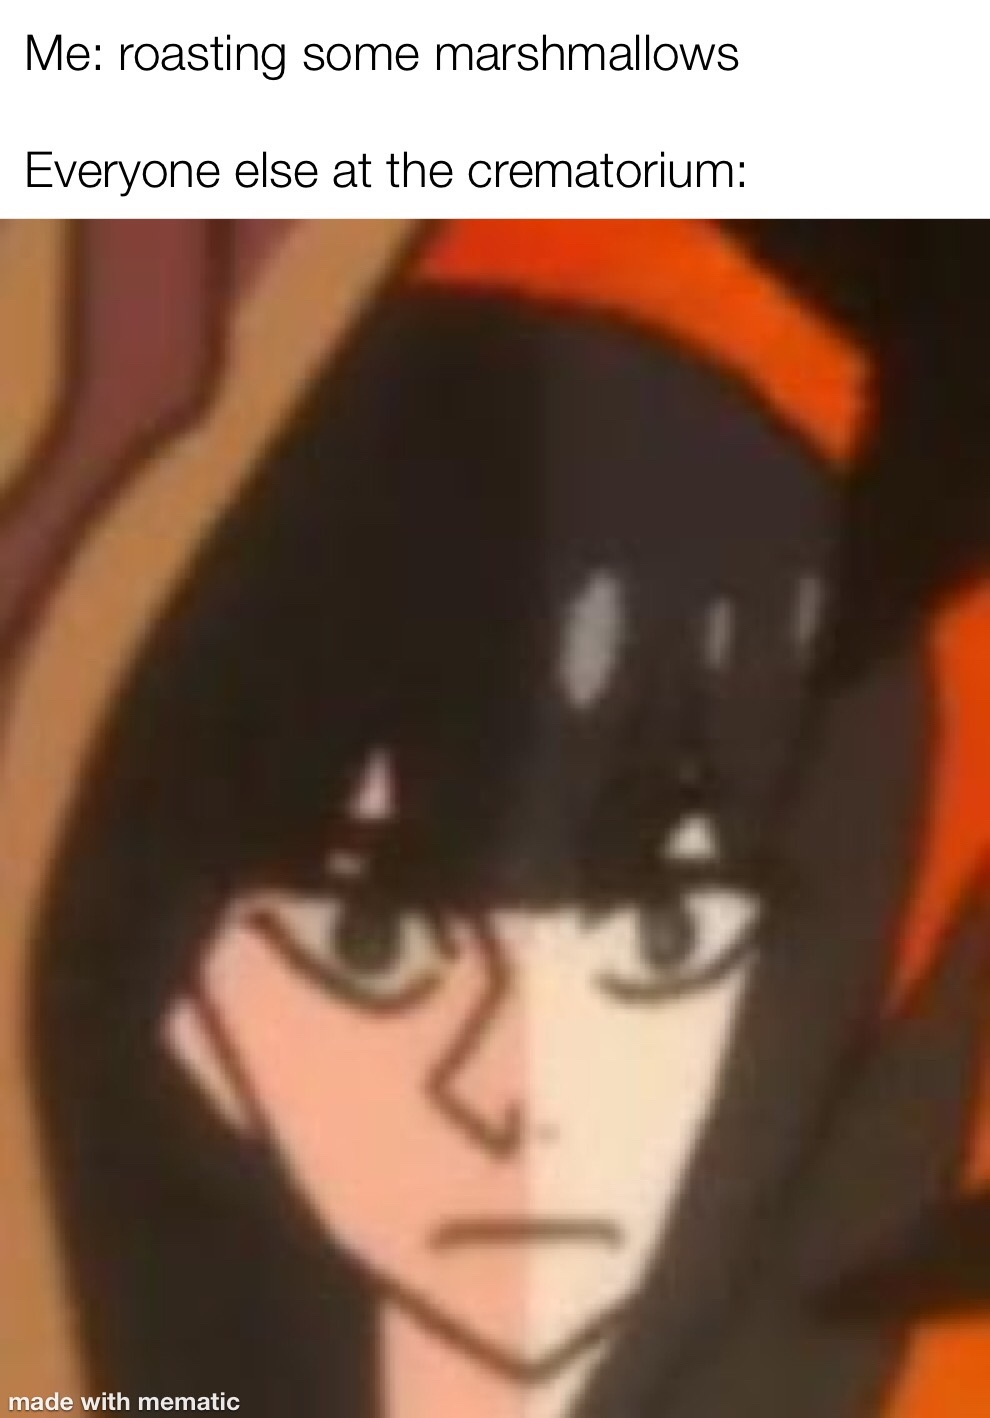 satsuki - meme